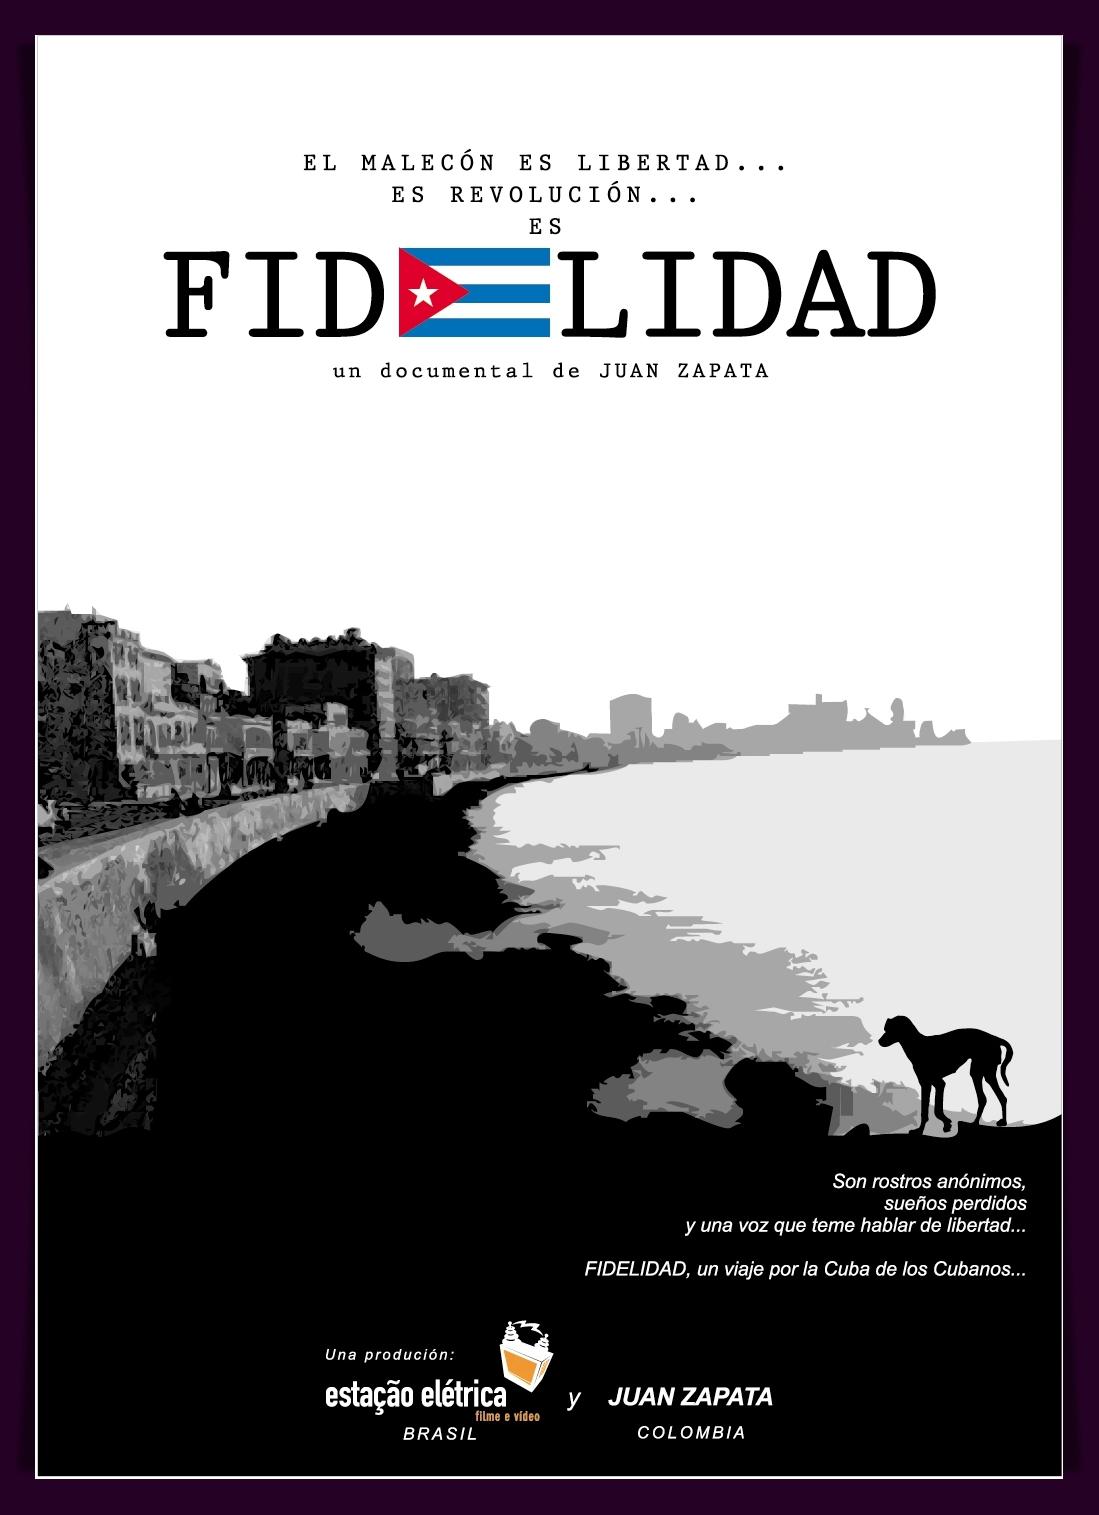 Fidelidad documental cuba afiche / Fidelidad cuba documentary poster